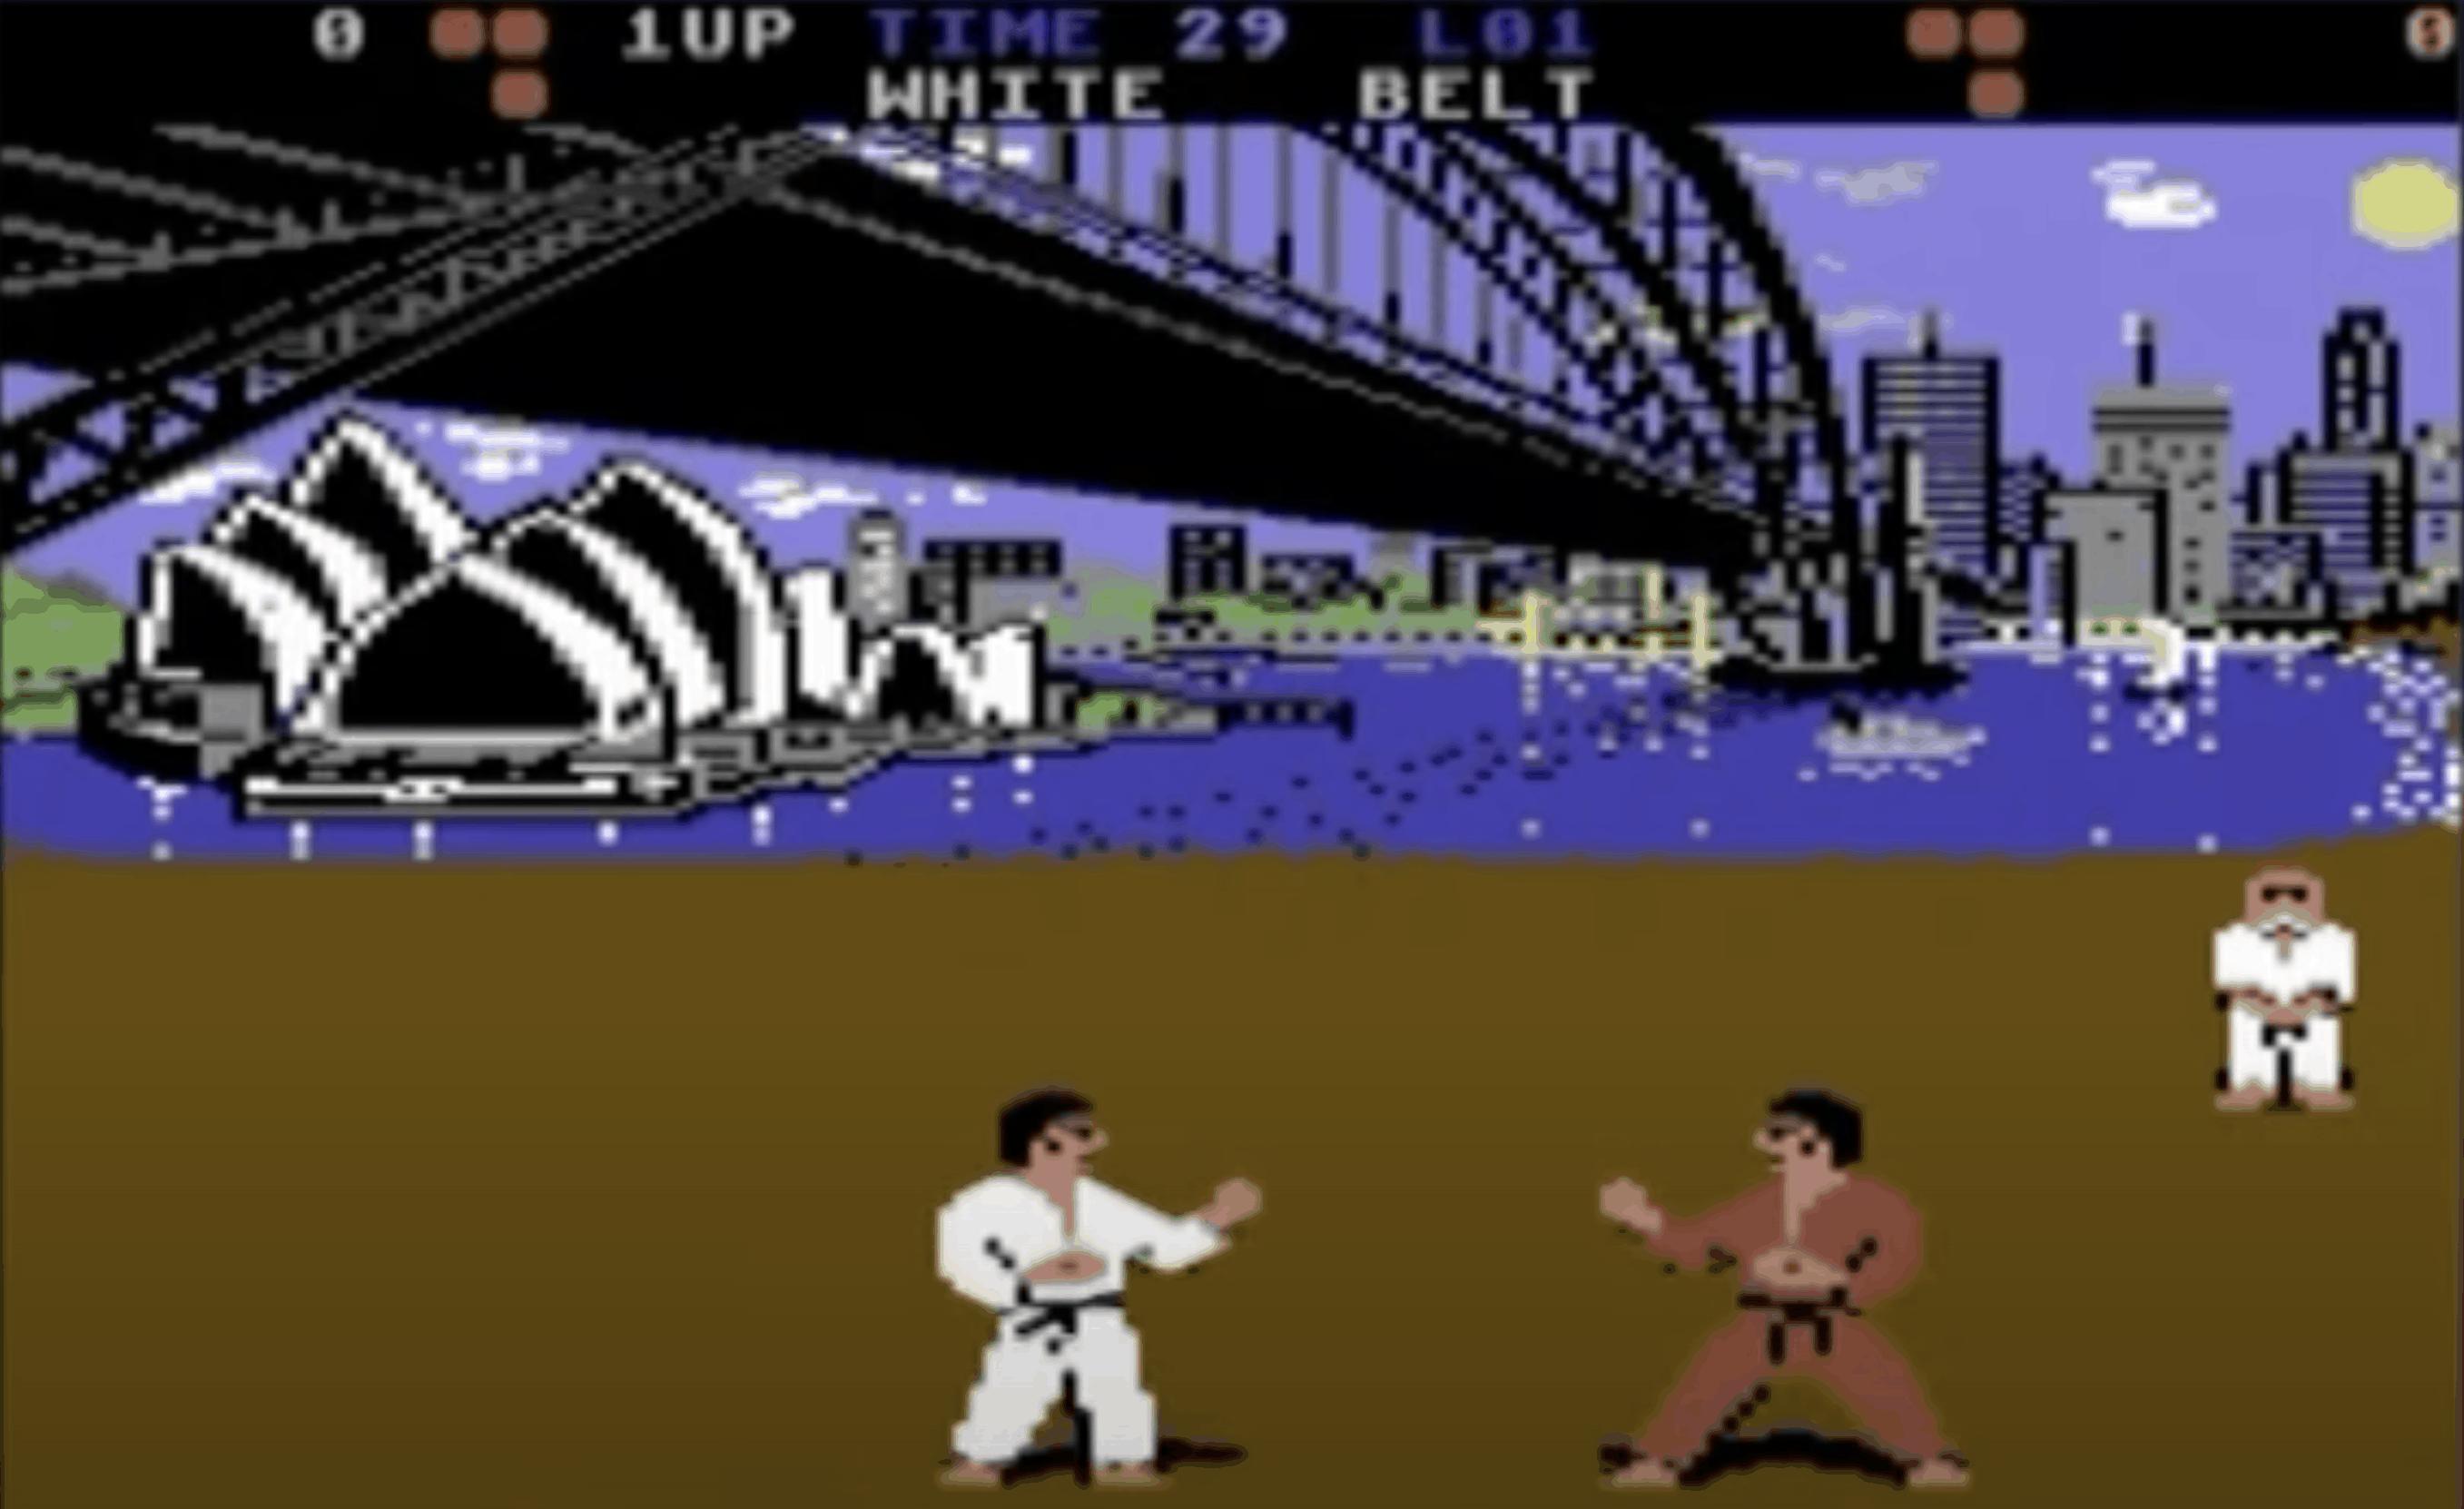 Videospiele als Kulturgut